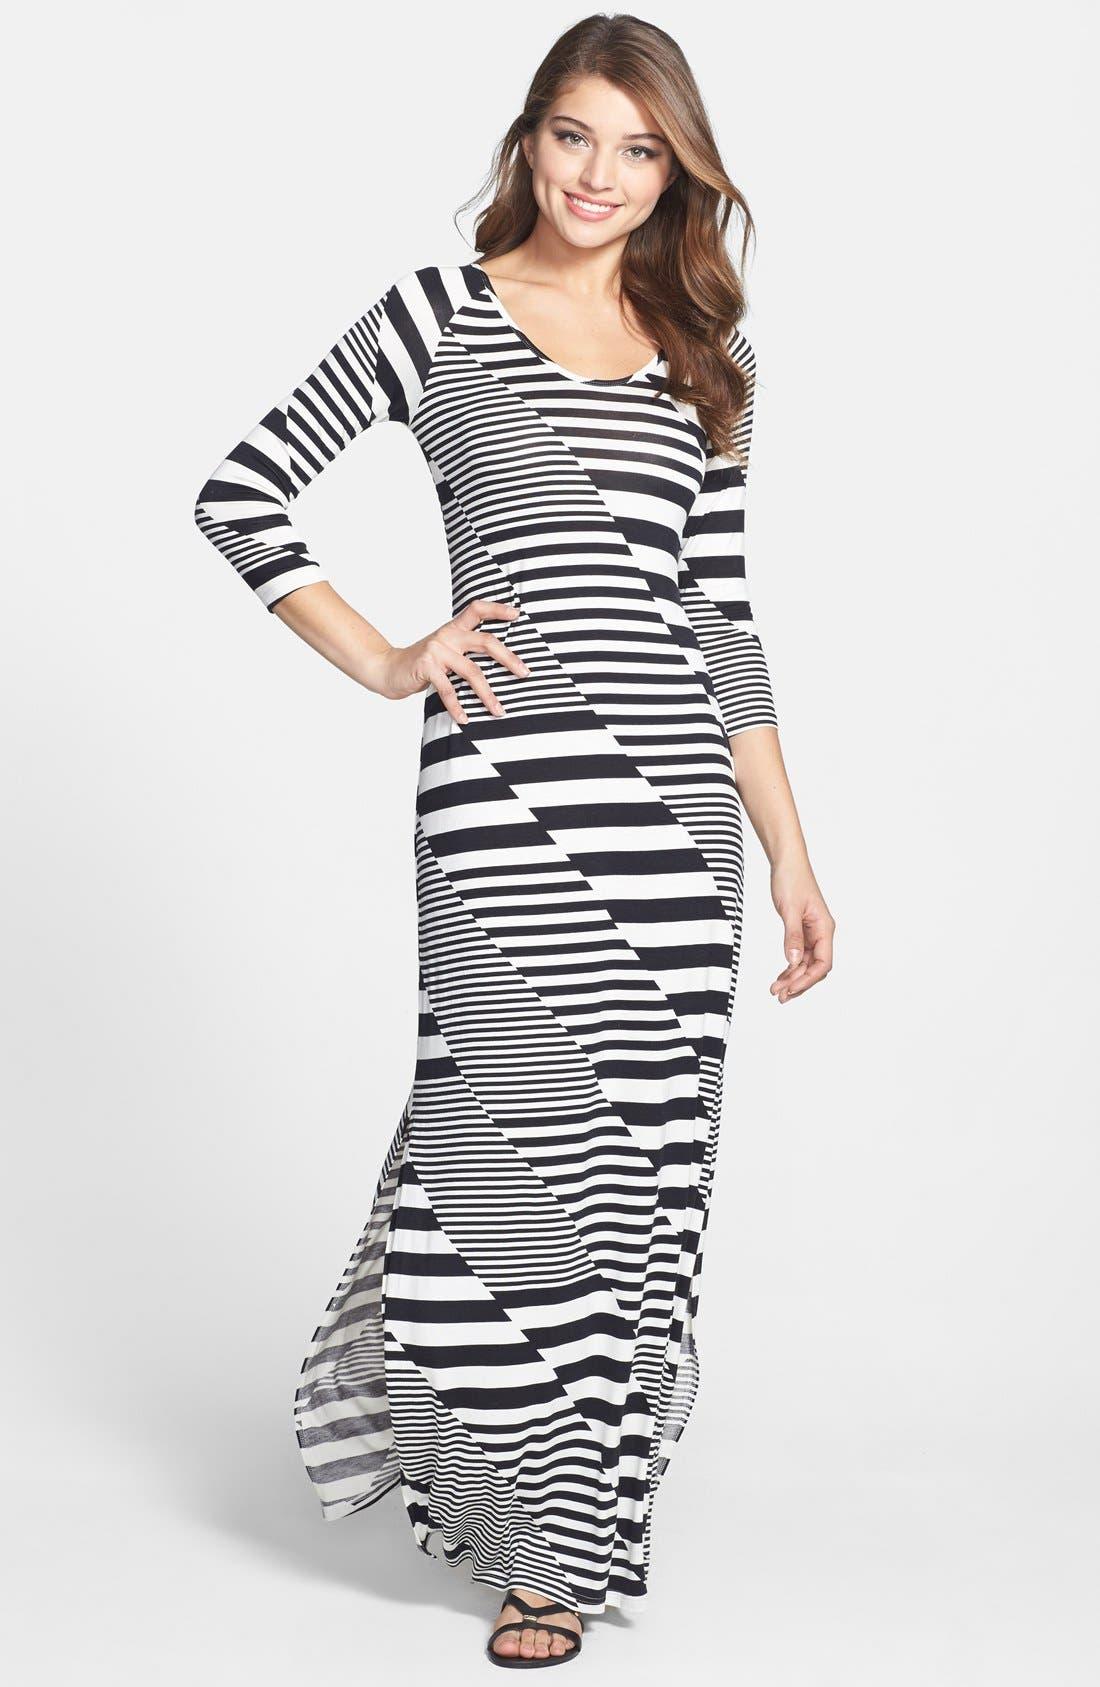 Alternate Image 1 Selected - Jessica Simpson 'Rowan' Stripe Maxi Dress